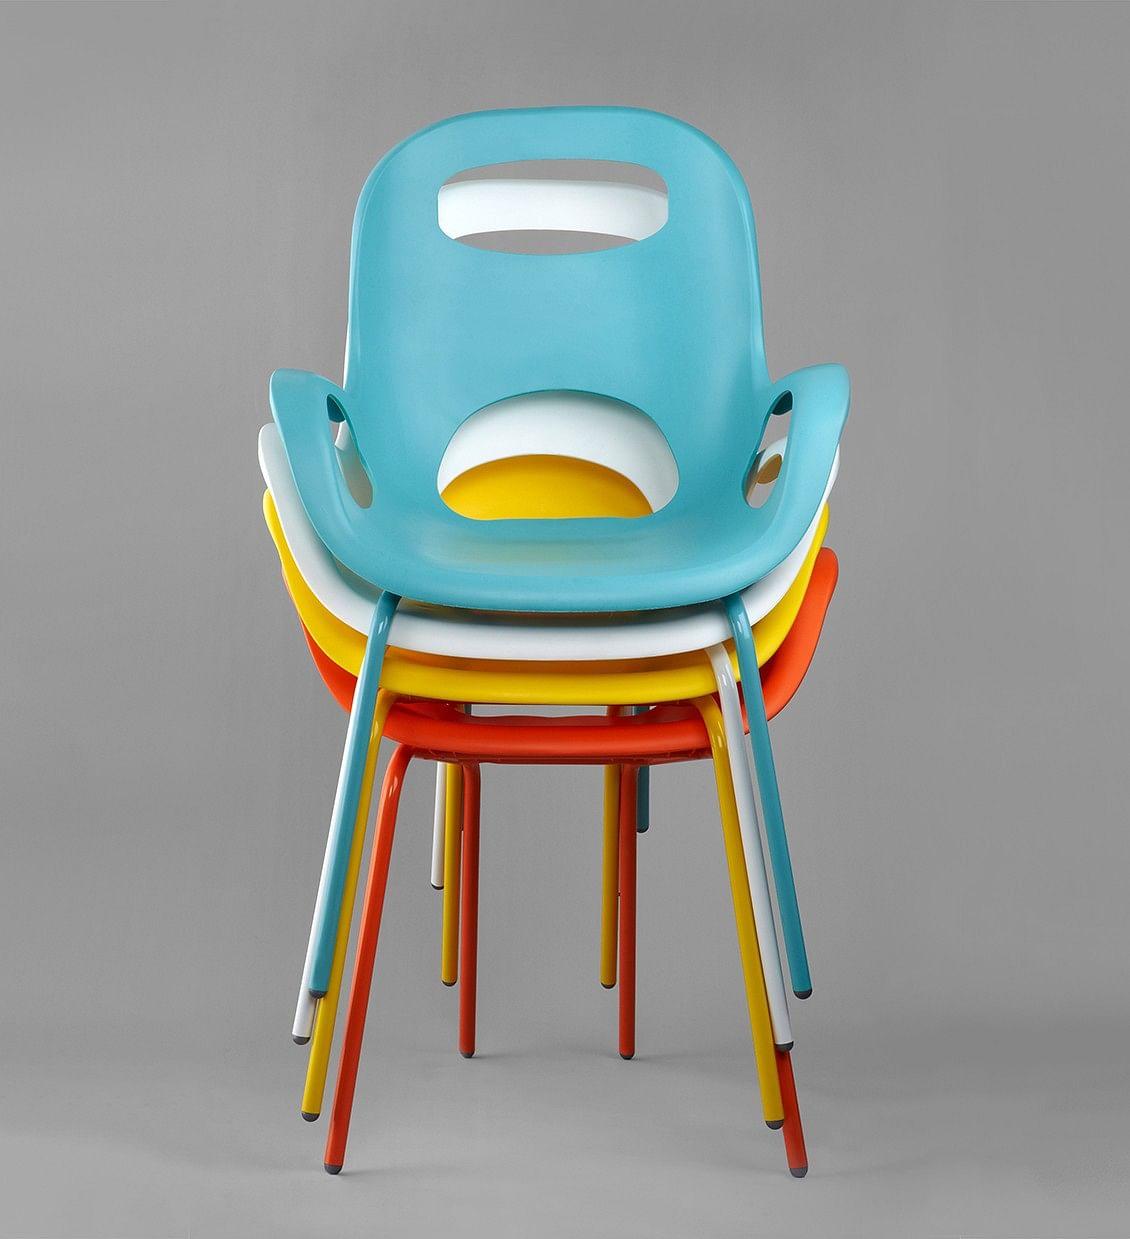 Interview Karim Rashid and his forthright views on design